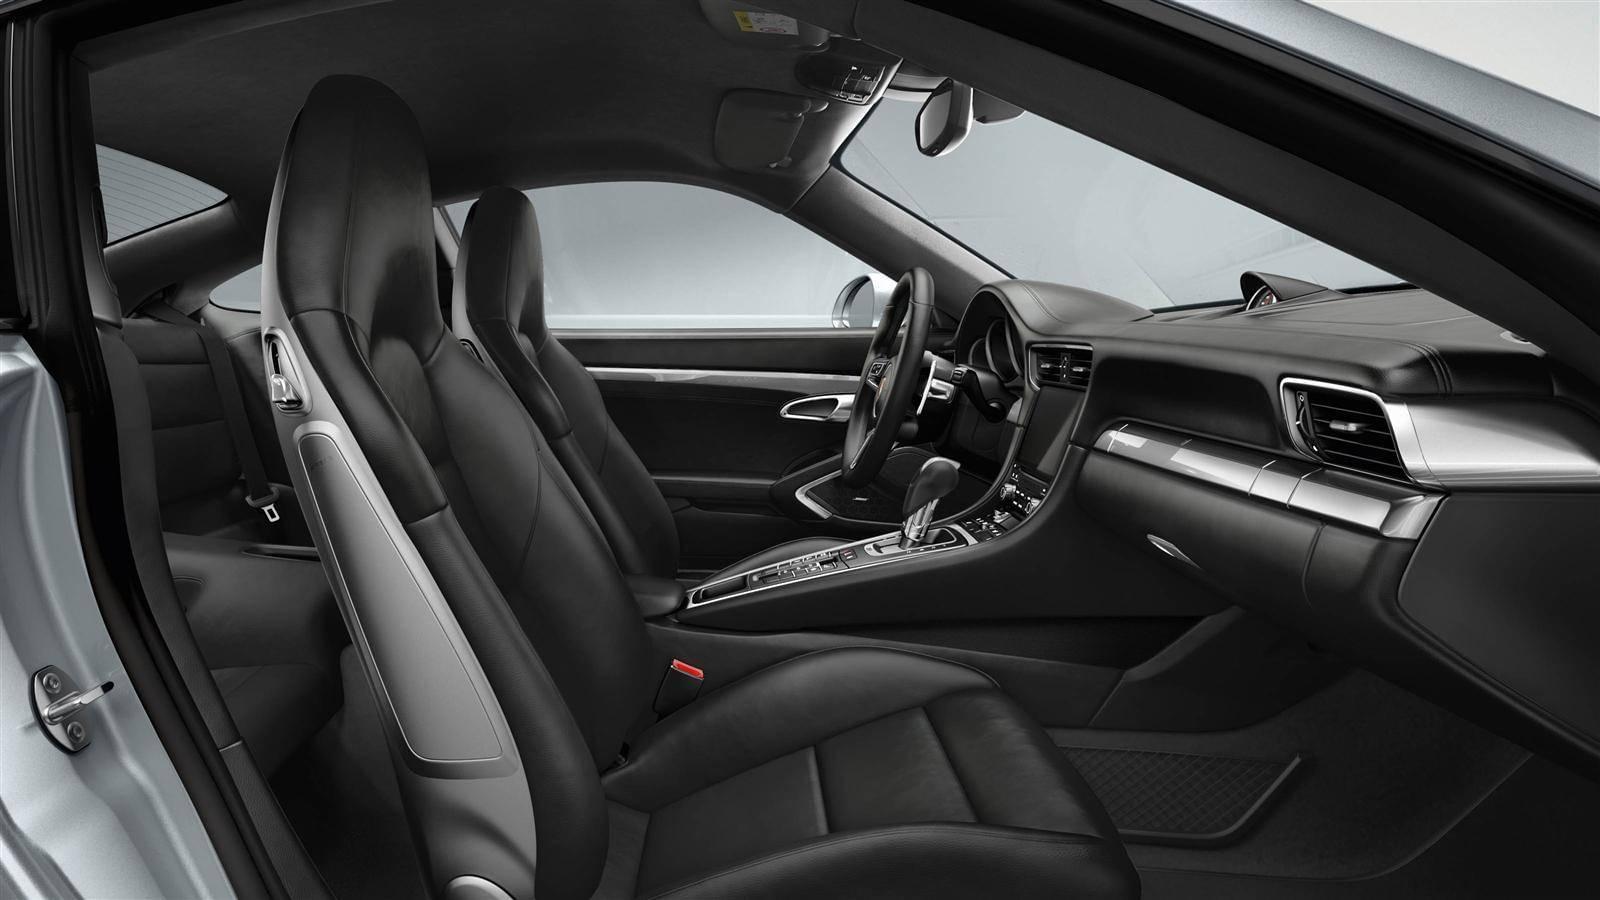 Porsche Turbo S Interior